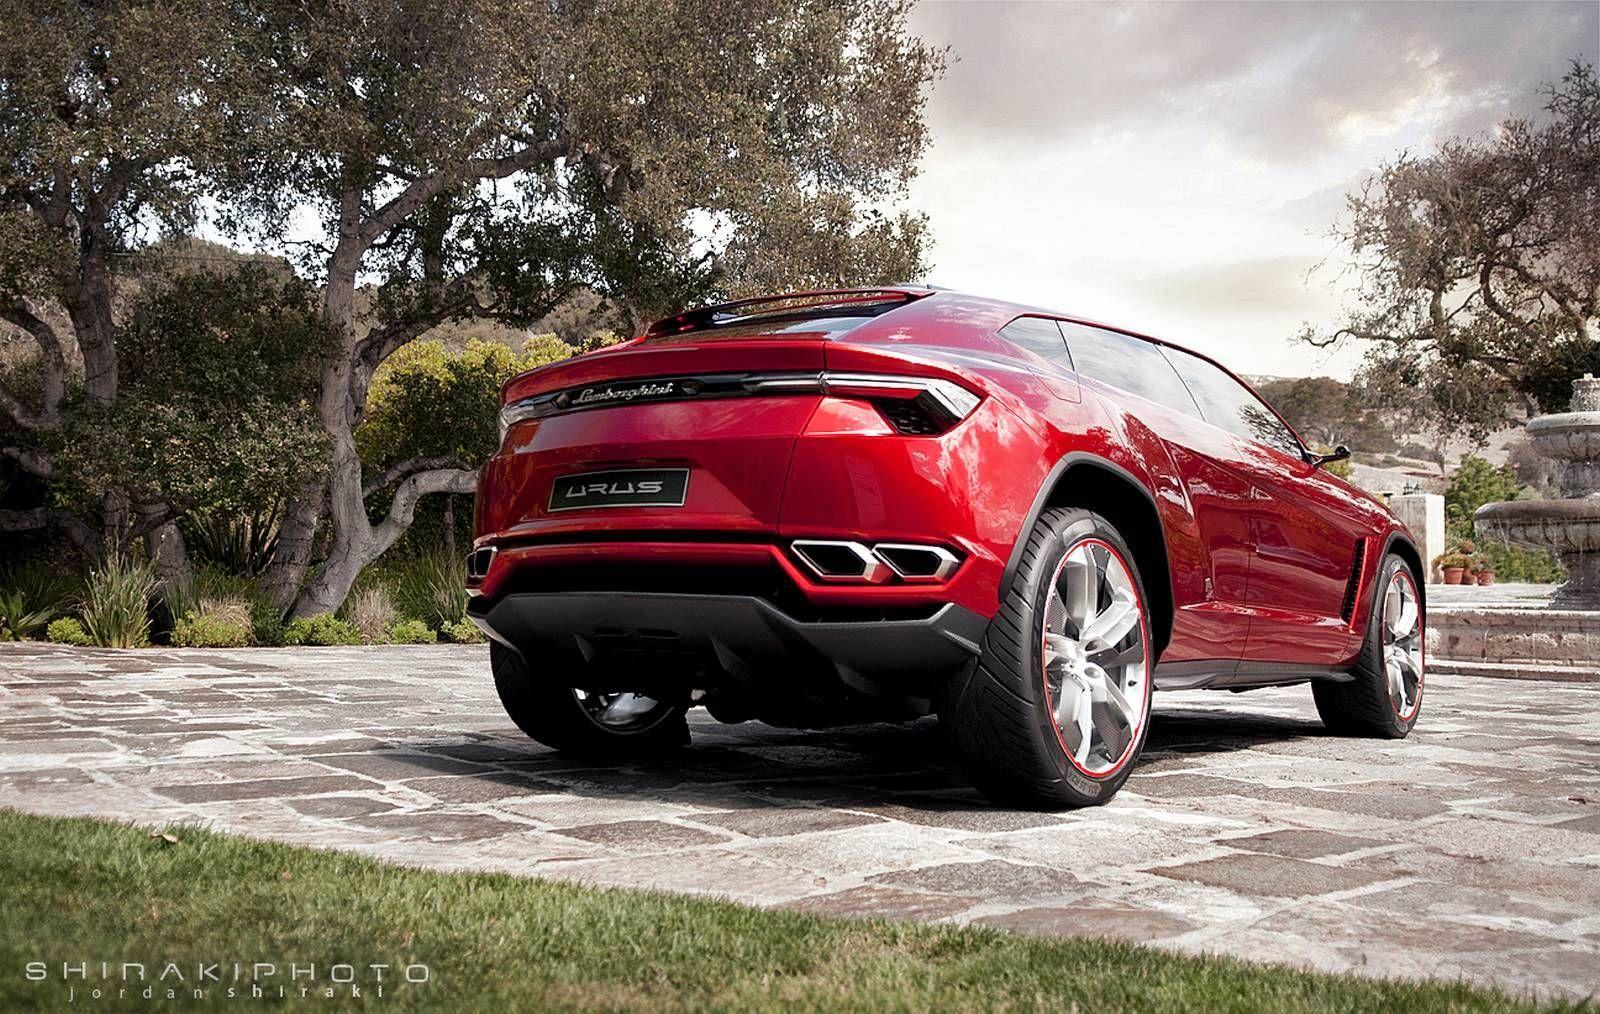 2017 Lamborghini Urus Specs Review & Price - Cnynewcars ...